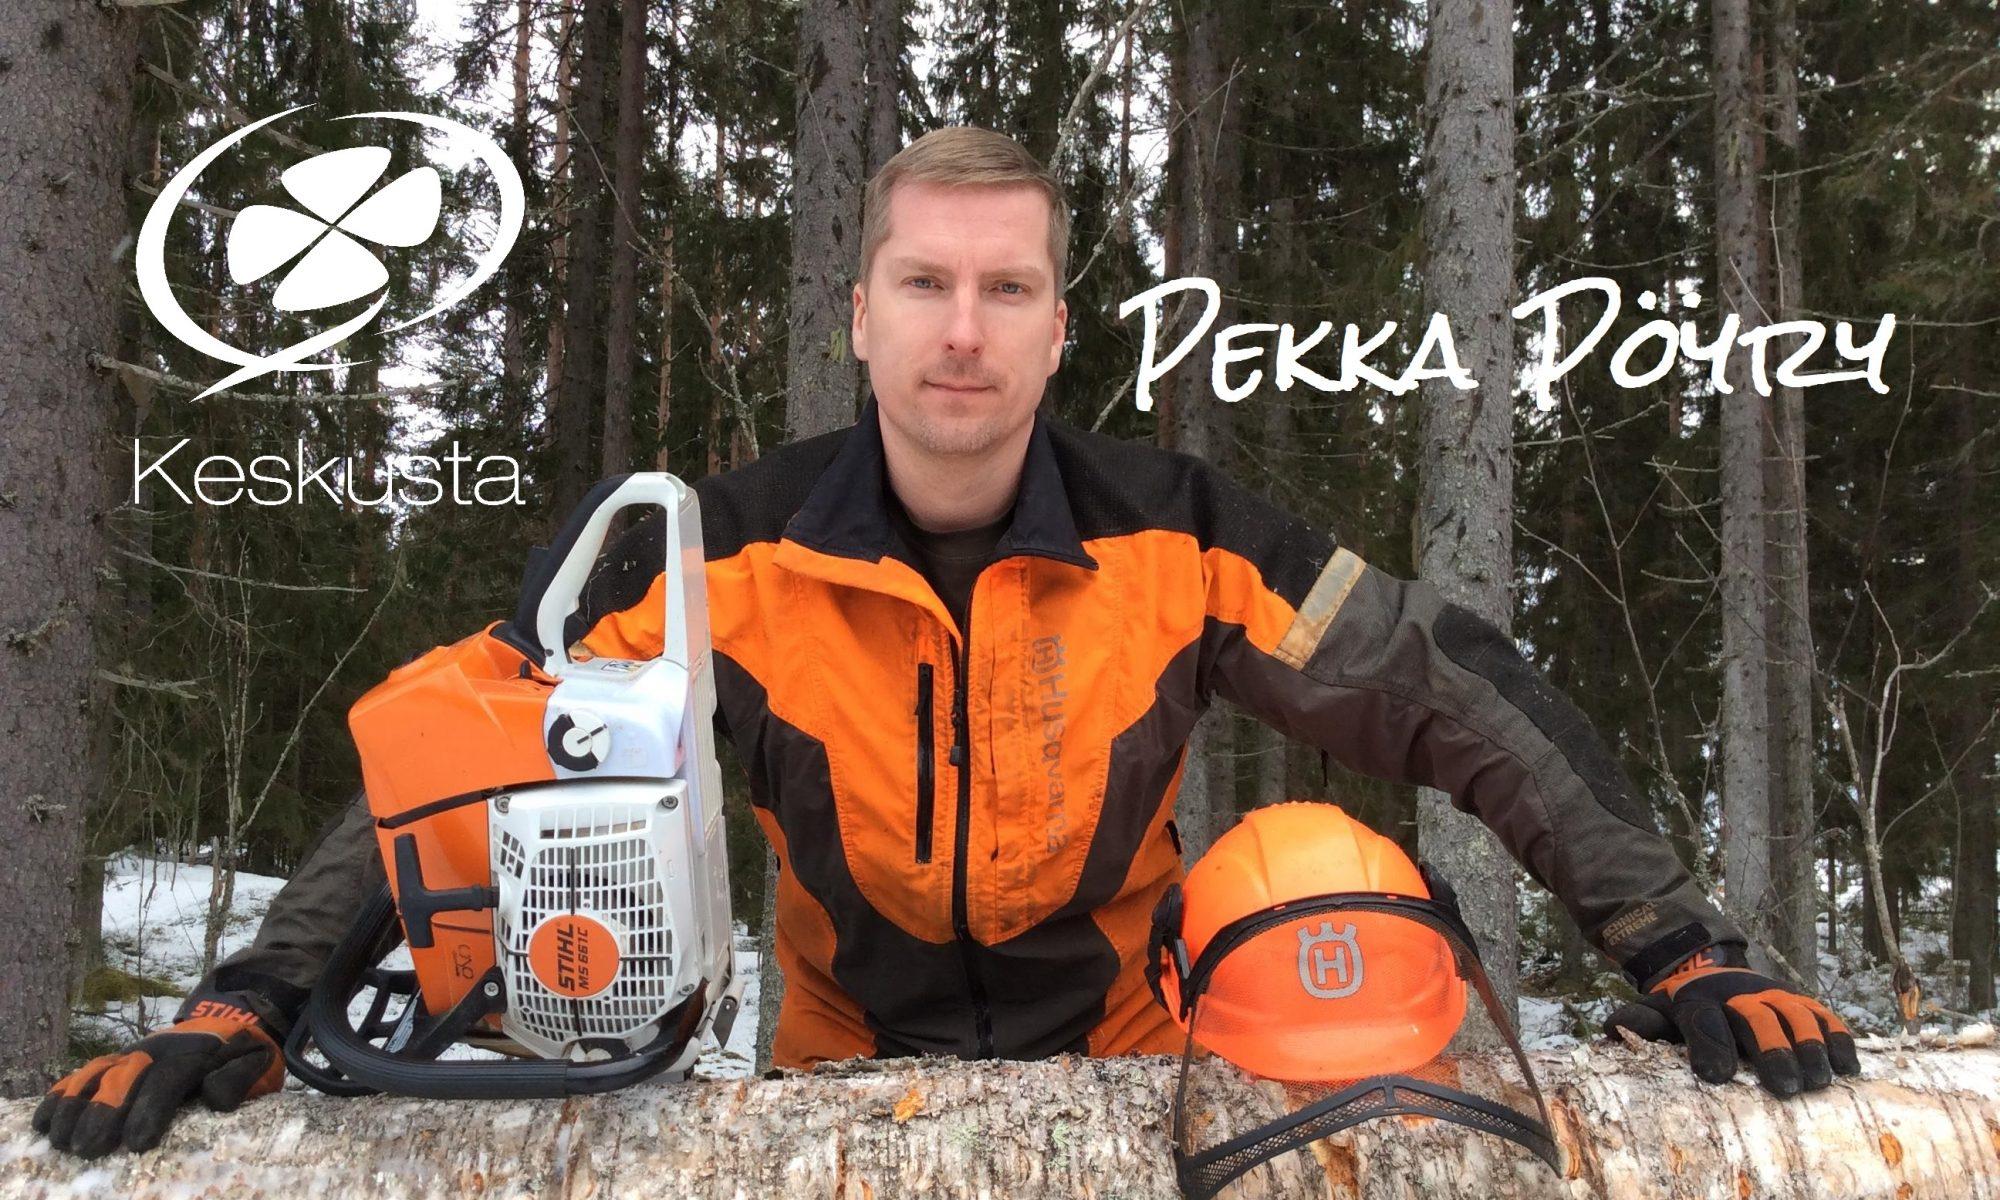 Pekka Pöyry